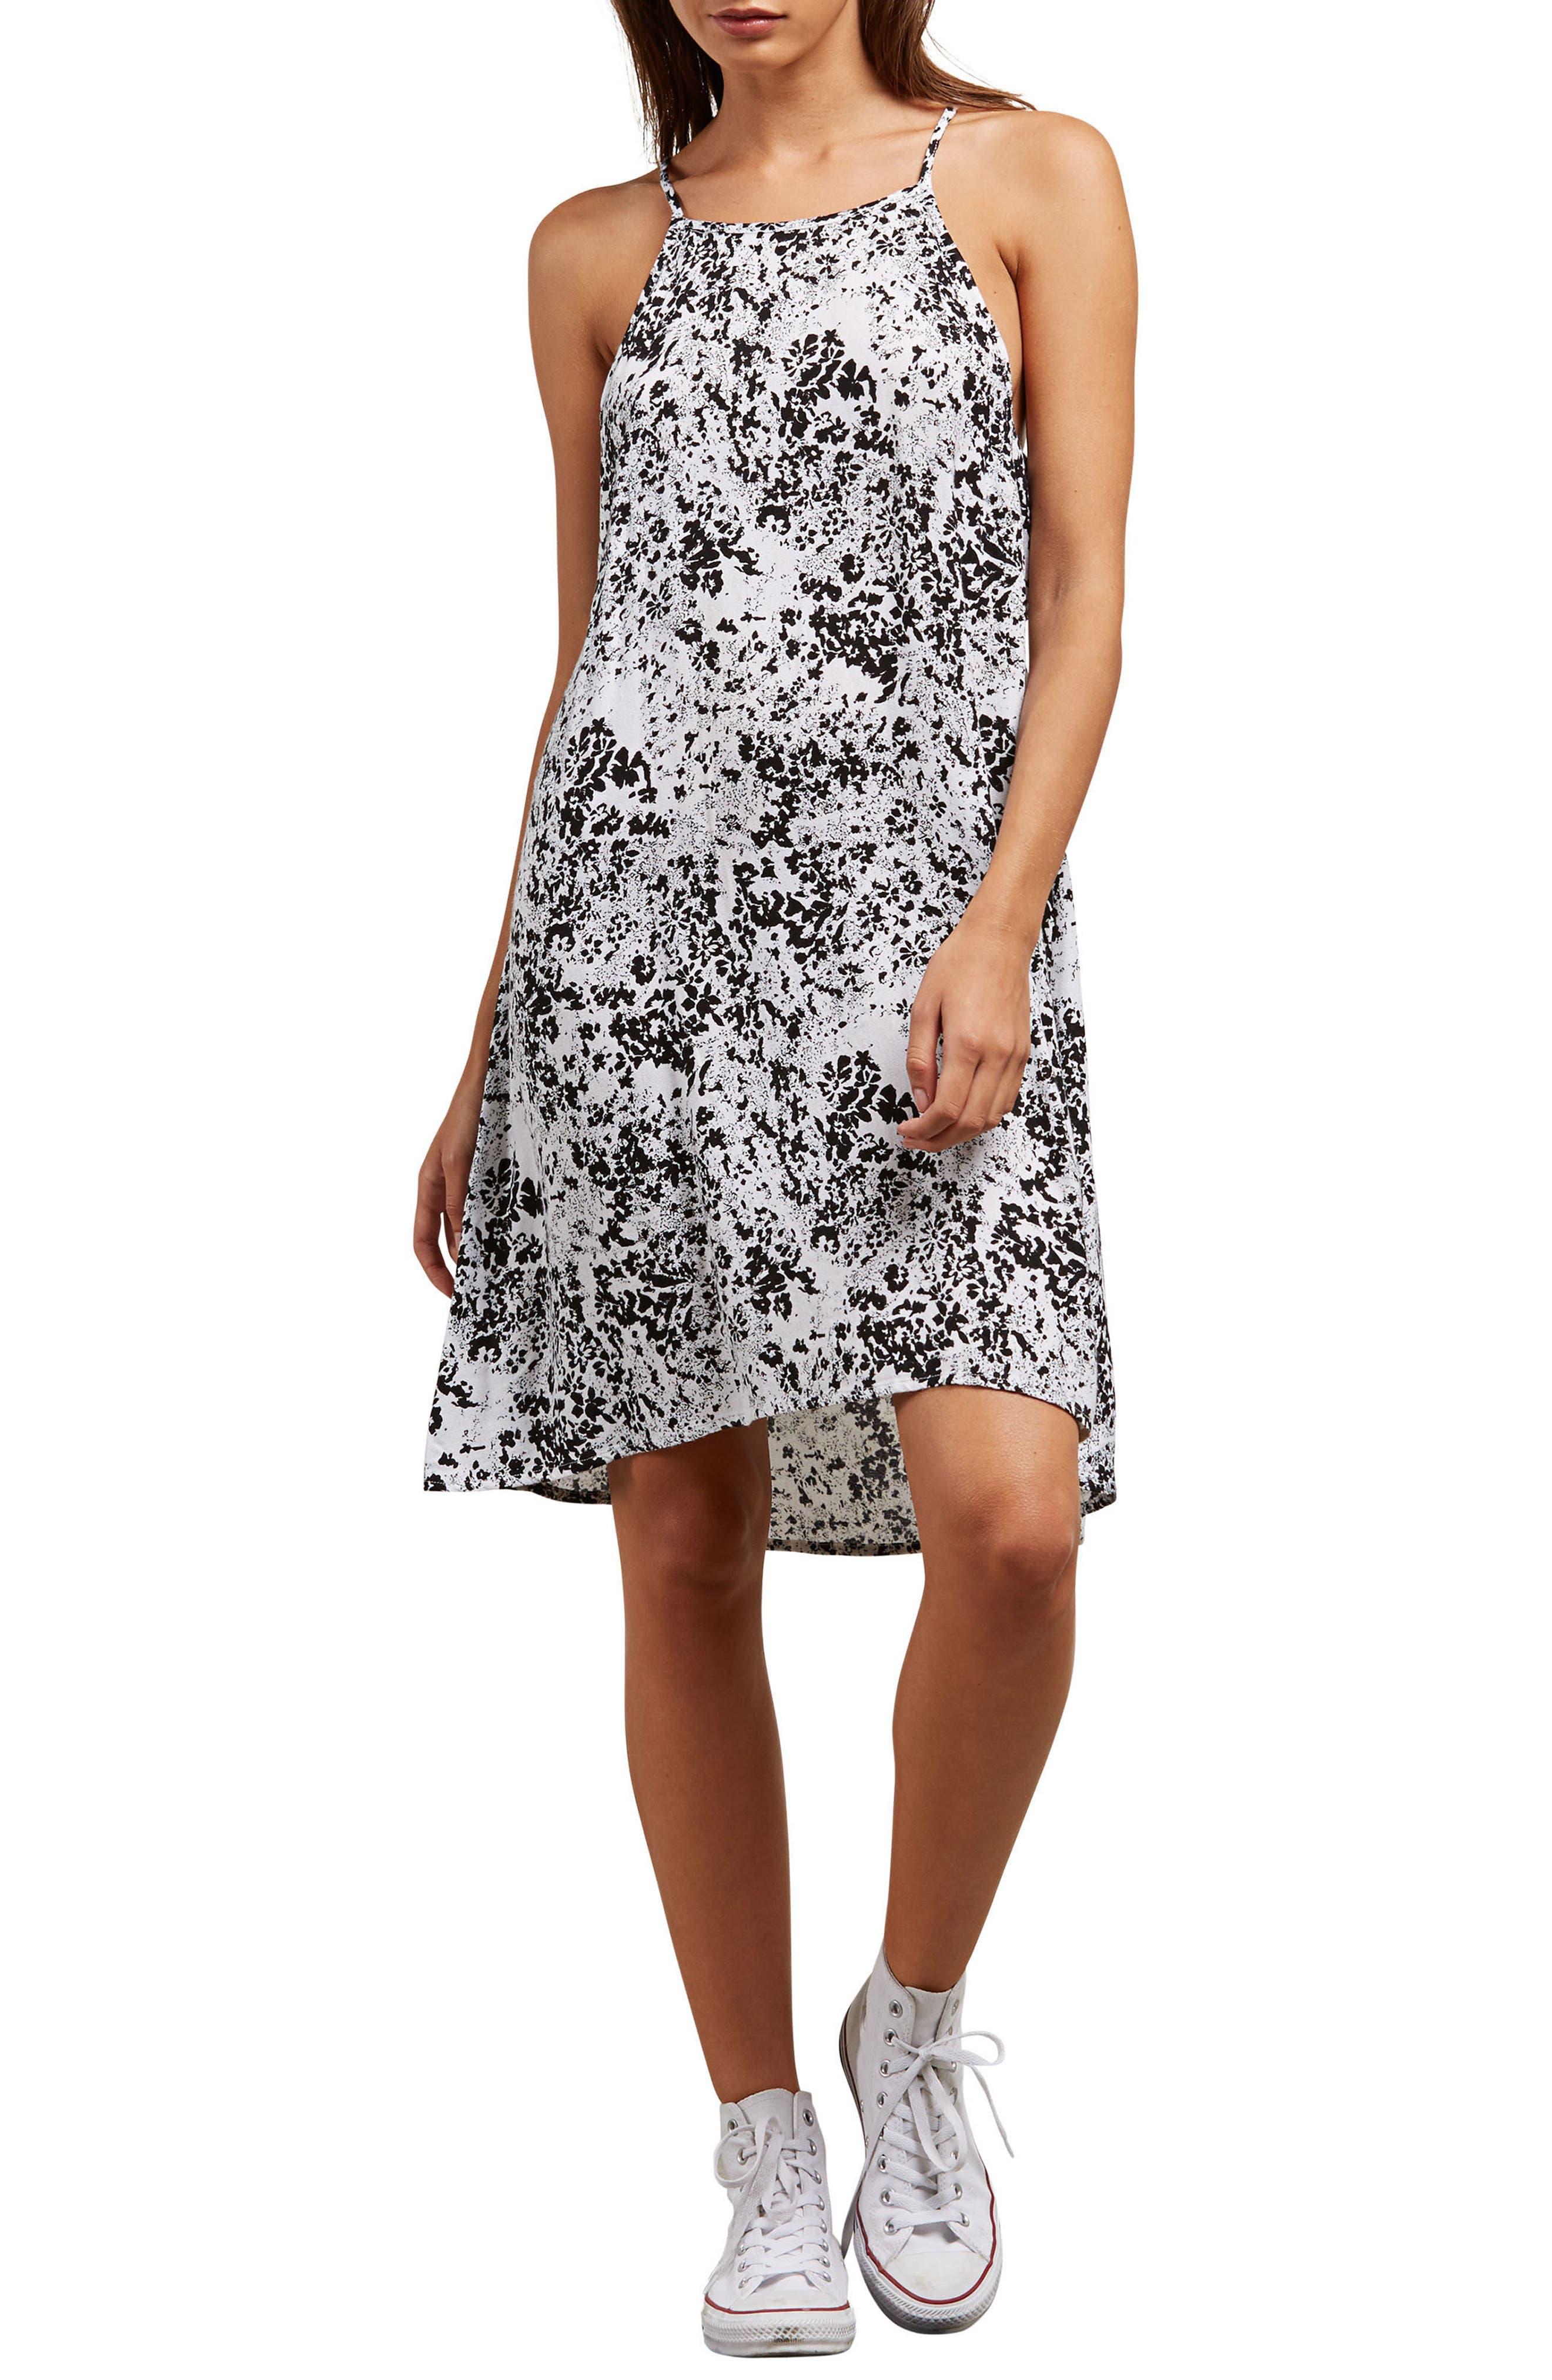 Soul Window Dress,                             Main thumbnail 1, color,                             Black/ White